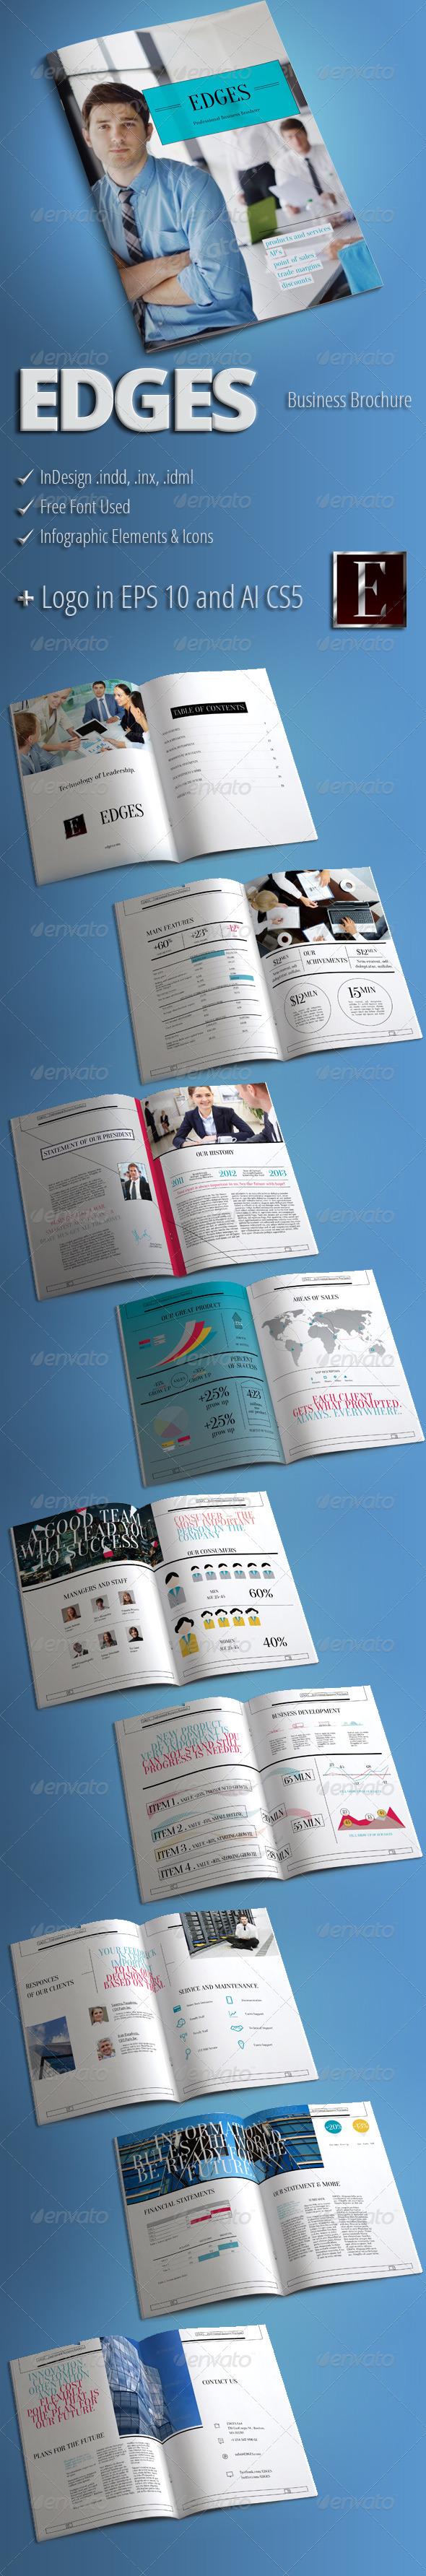 EDGES - Modern Business Brochure - Corporate Brochures